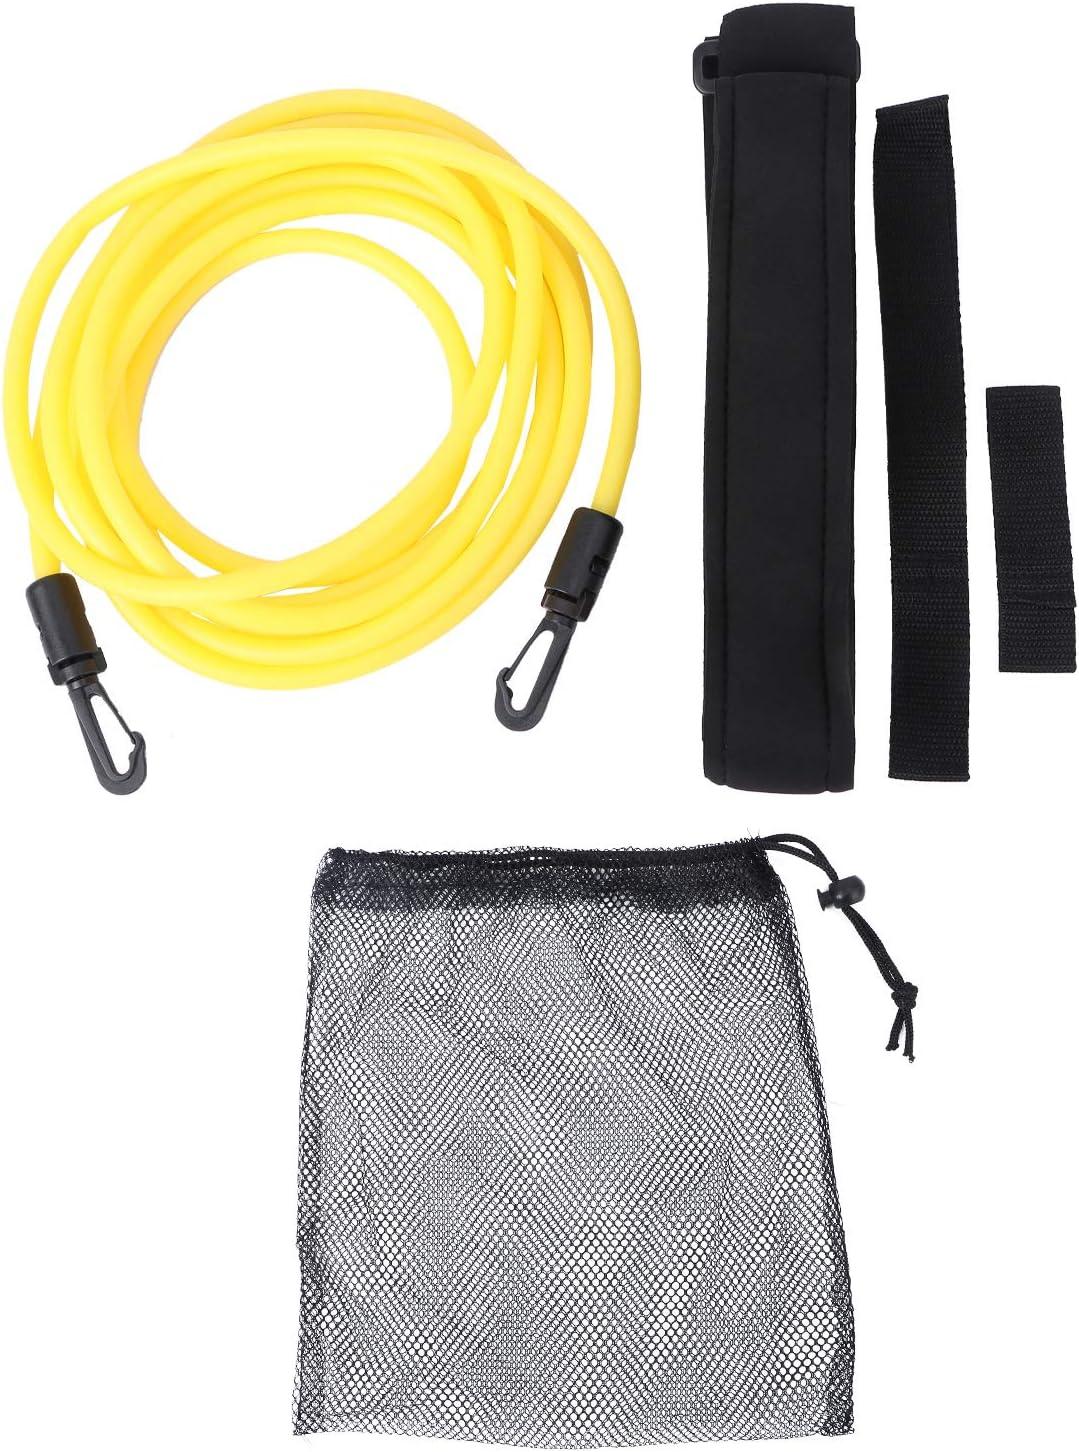 Many popular brands Abaodam Swimming Resistance Belt Set Band Training Swim Over item handling Ela